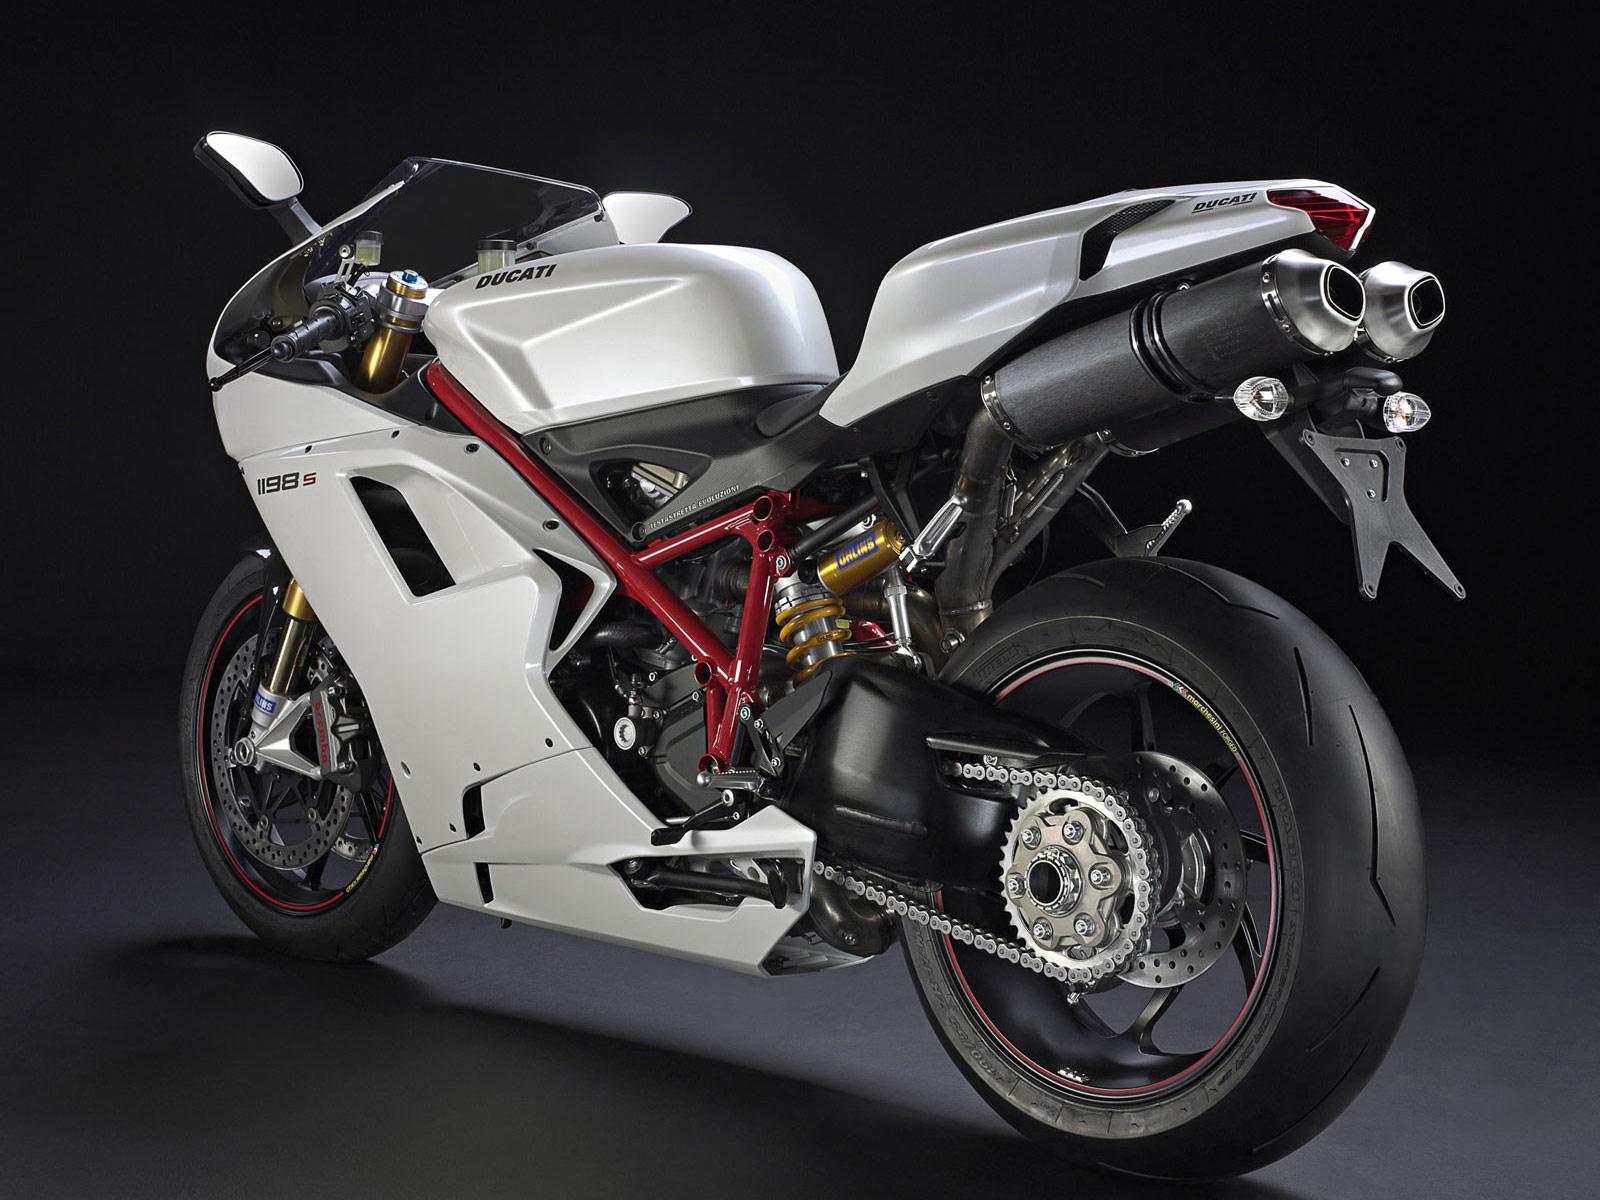 Ducati 1198 S 2010 pics()